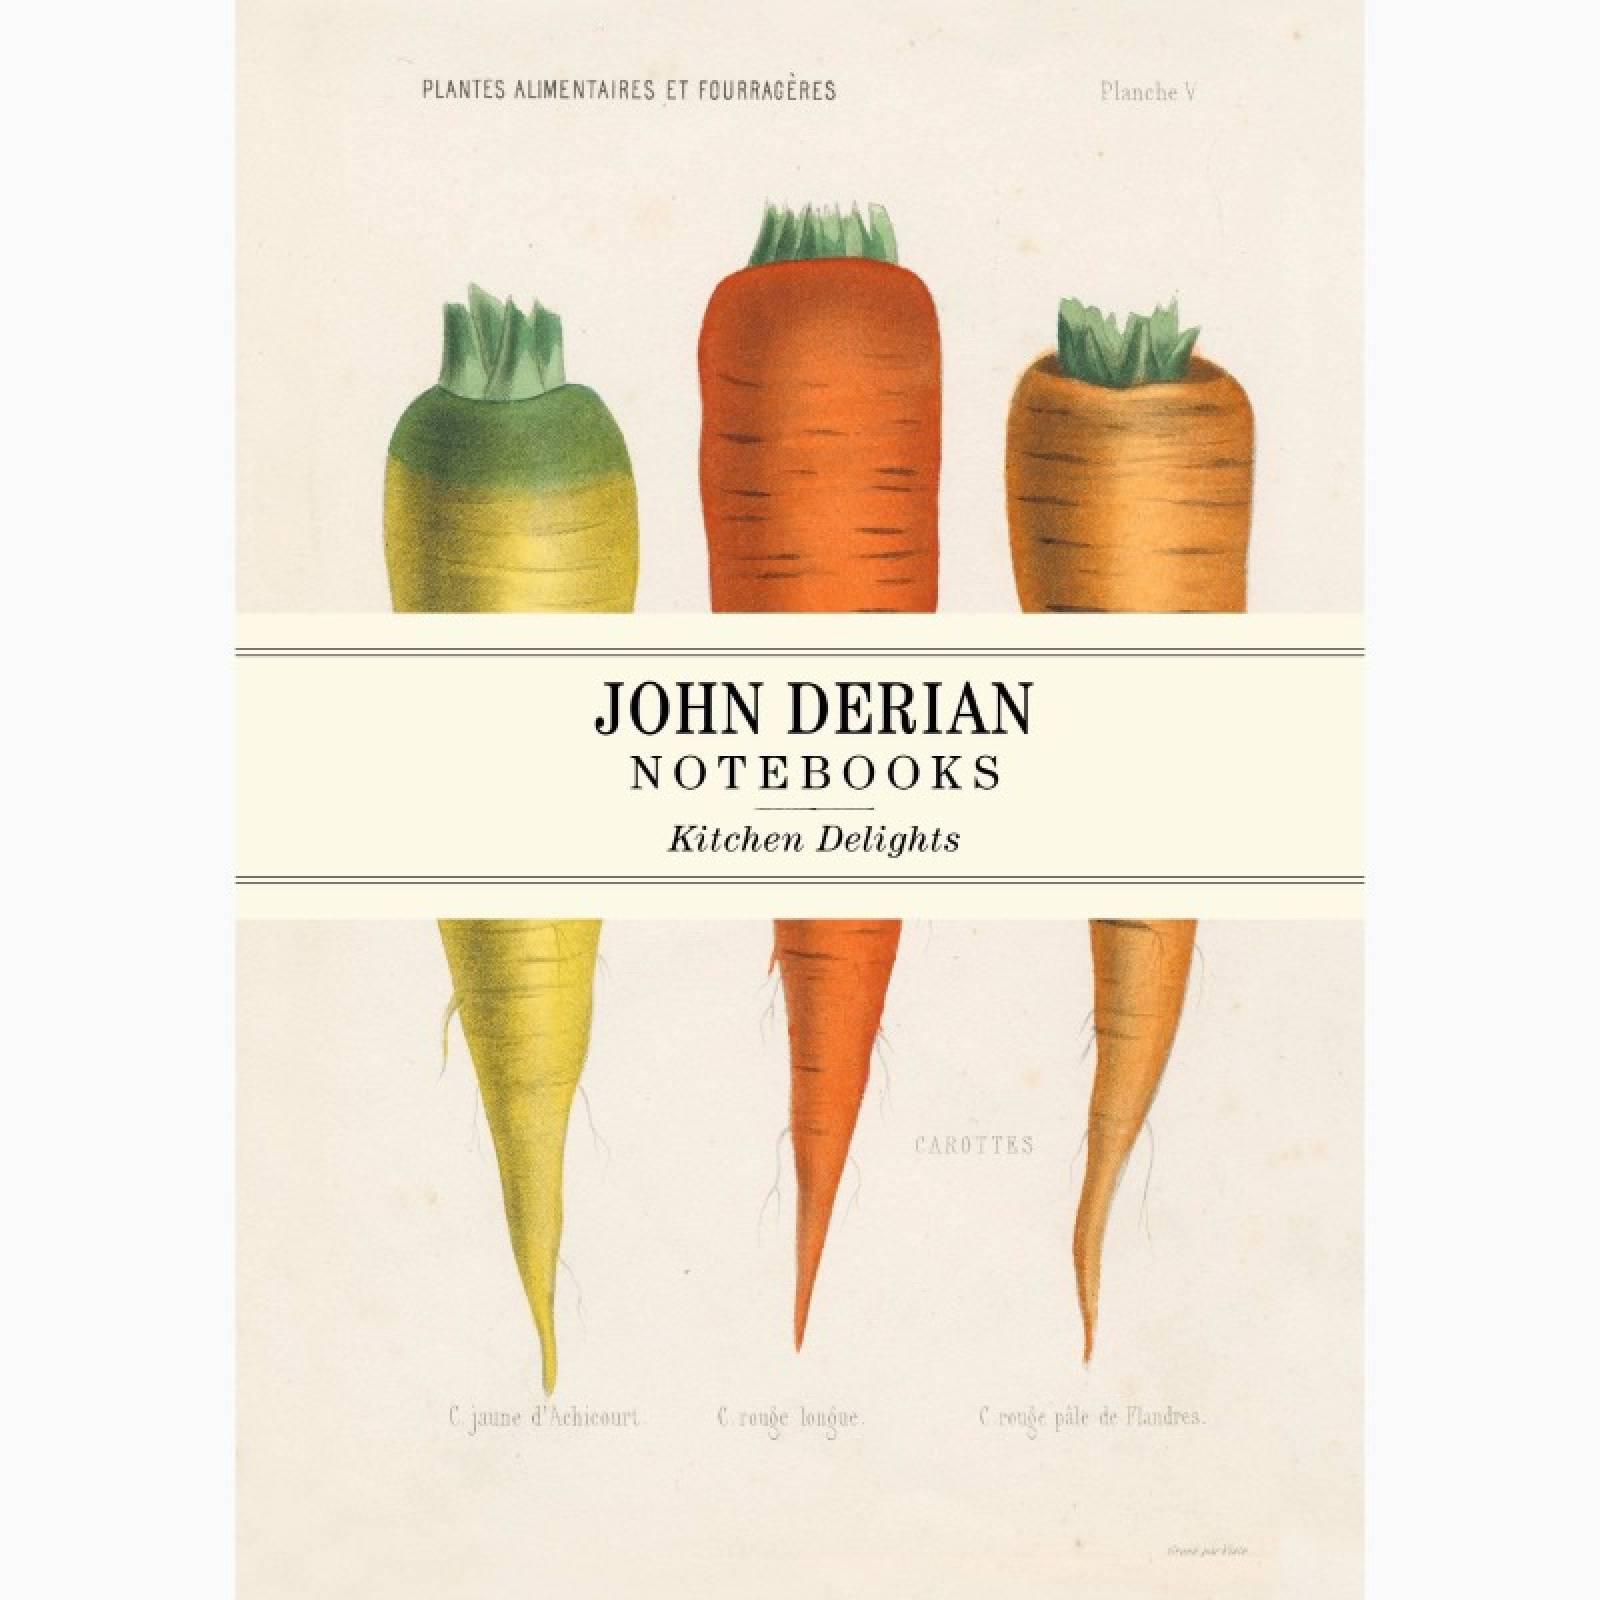 Kitchen Delights By John Derian - Set Of 3 Notebooks